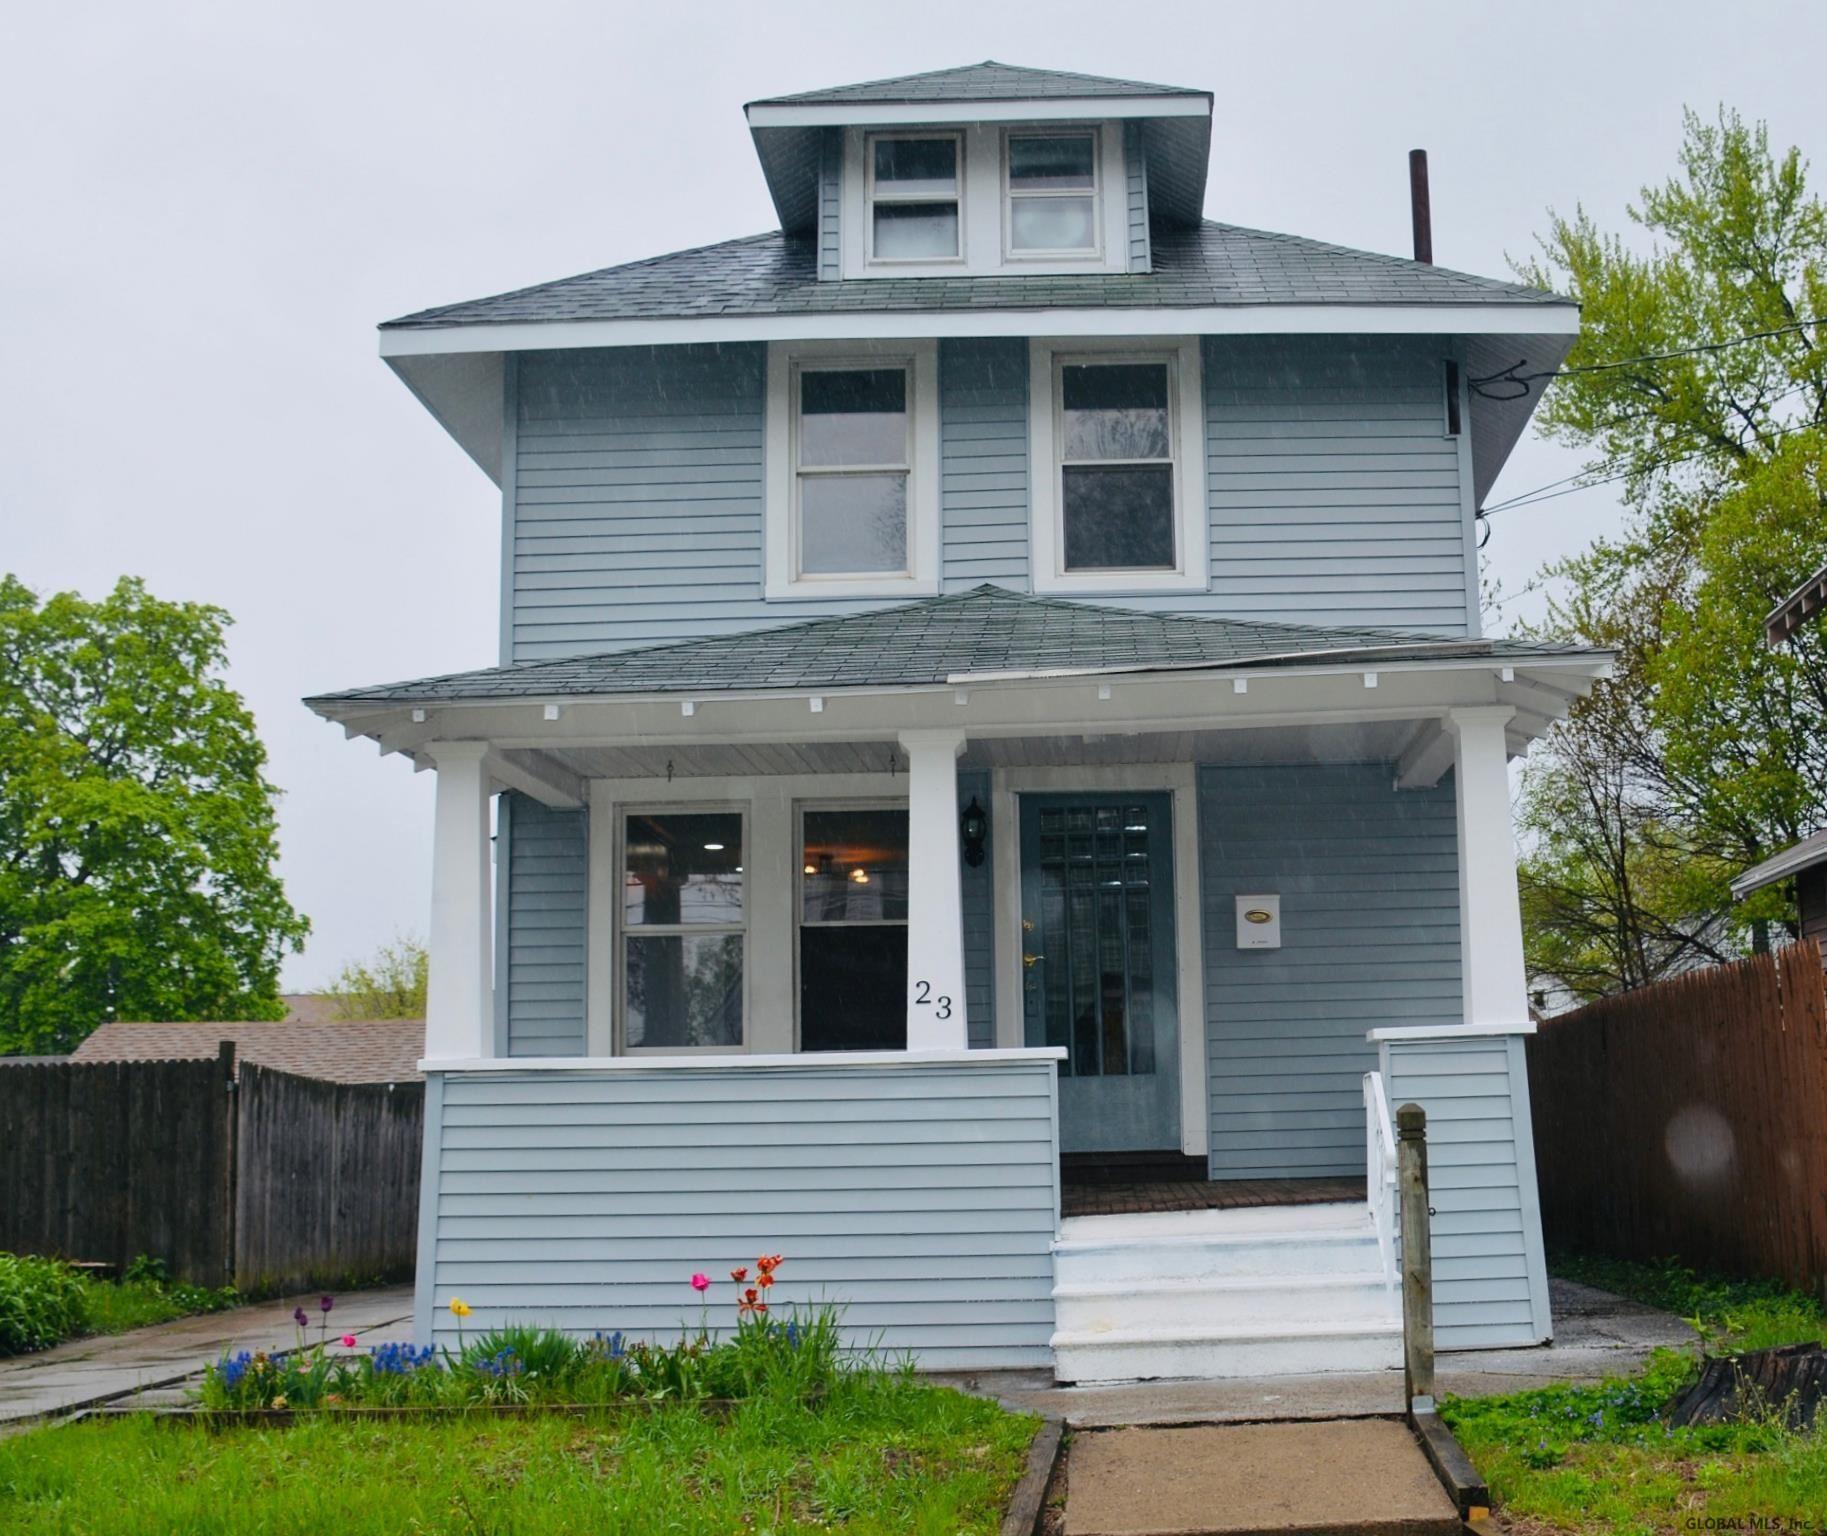 23 FRANK ST, Schenectady, NY 12304-3106 - #: 202118065